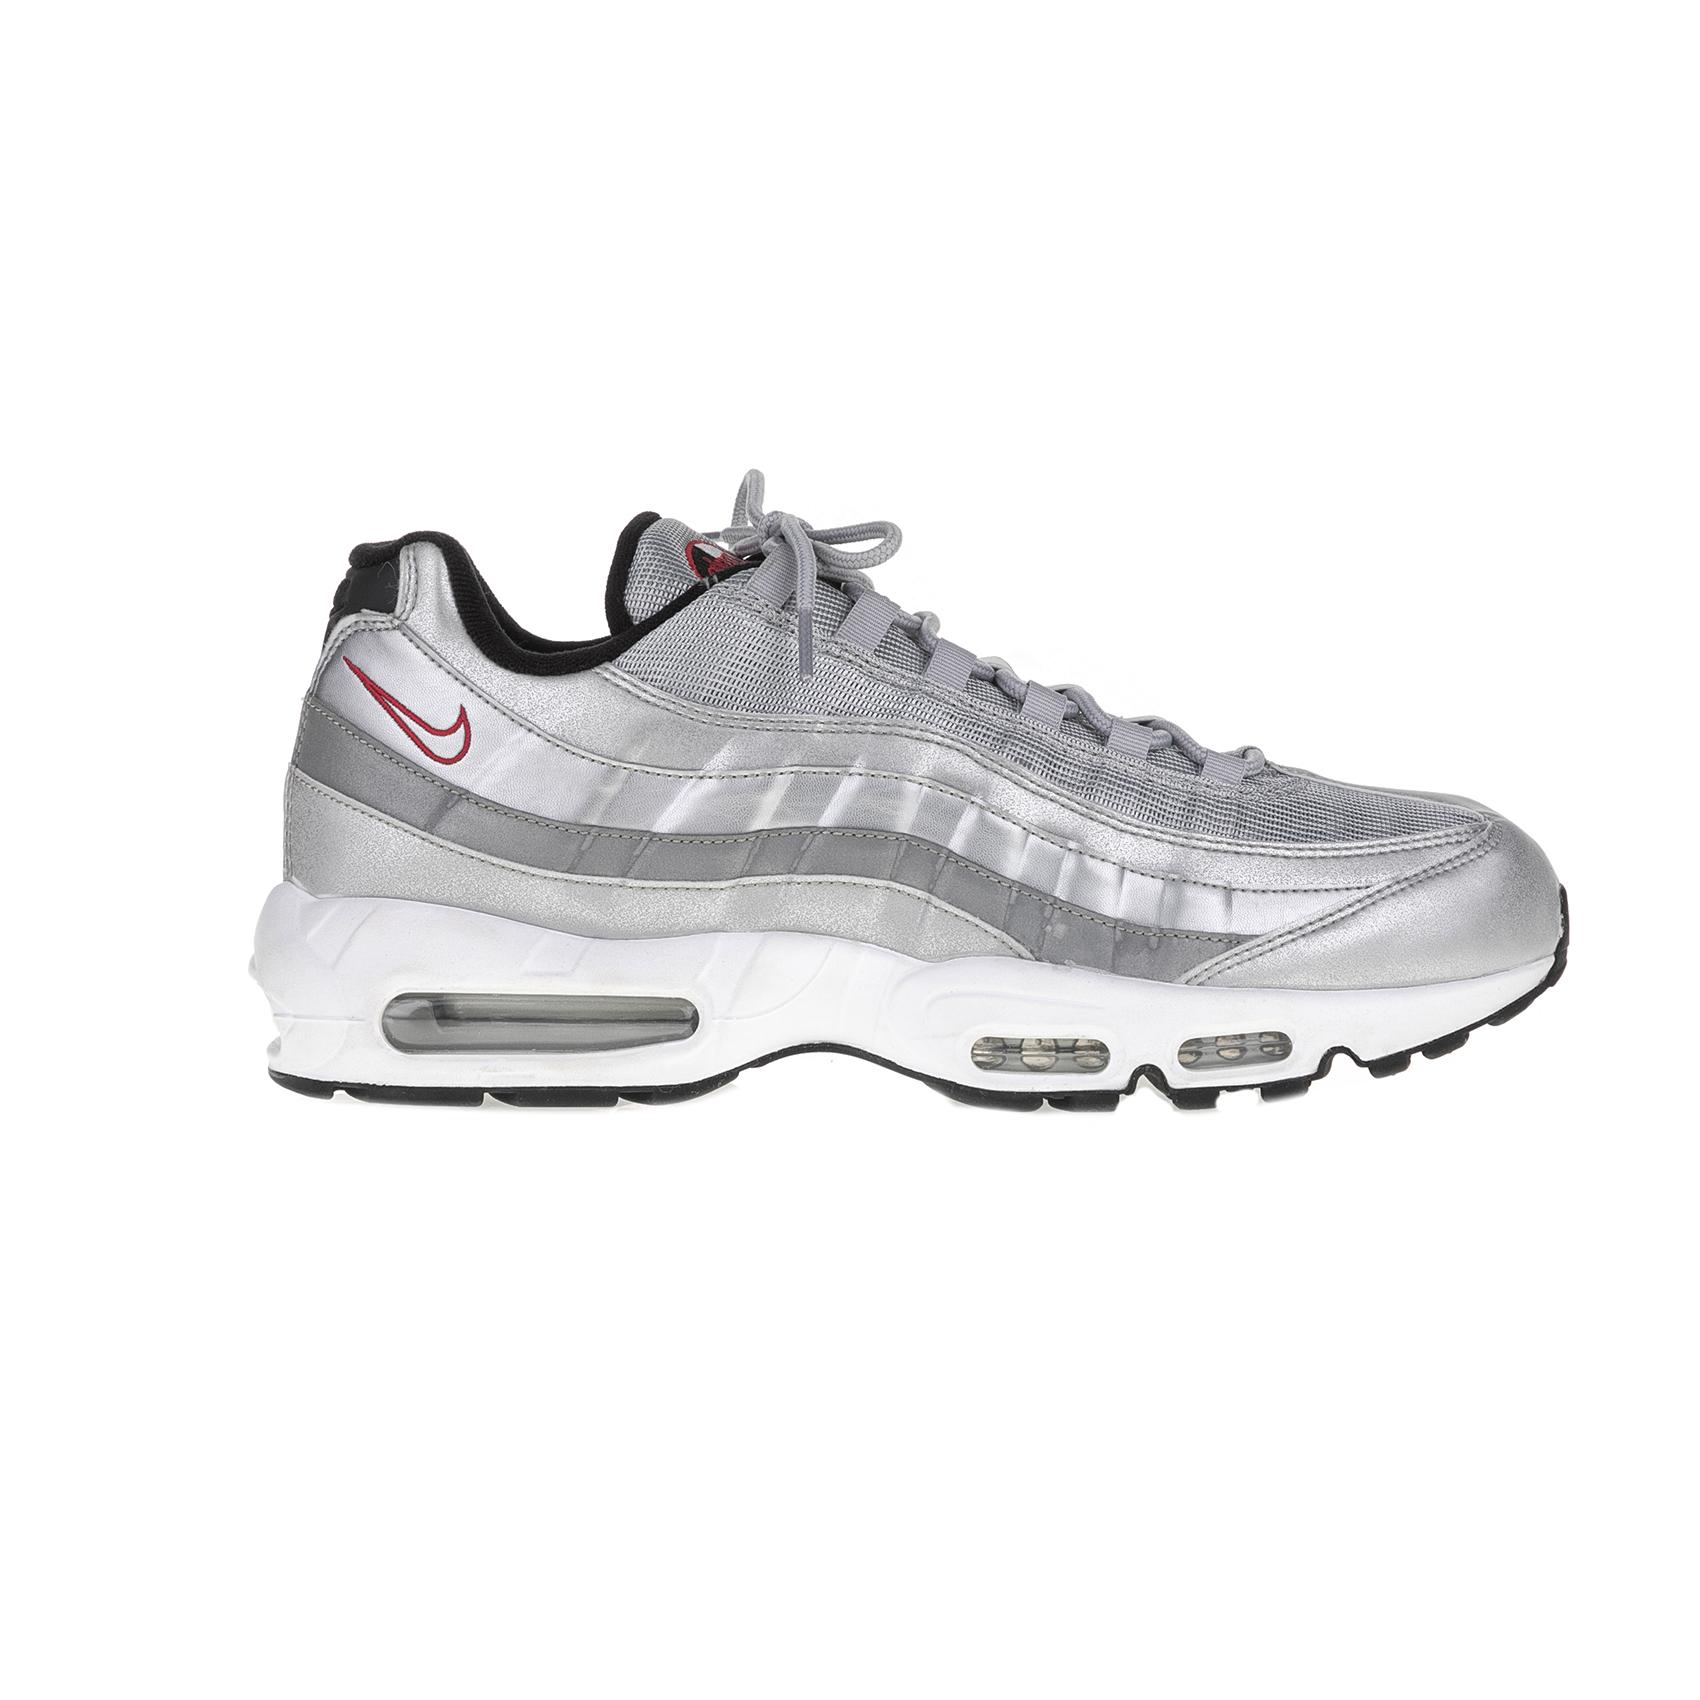 NIKE – Ανδρικά παπούτσια Nike AIR MAX 95 PREMIUM QS ασημί